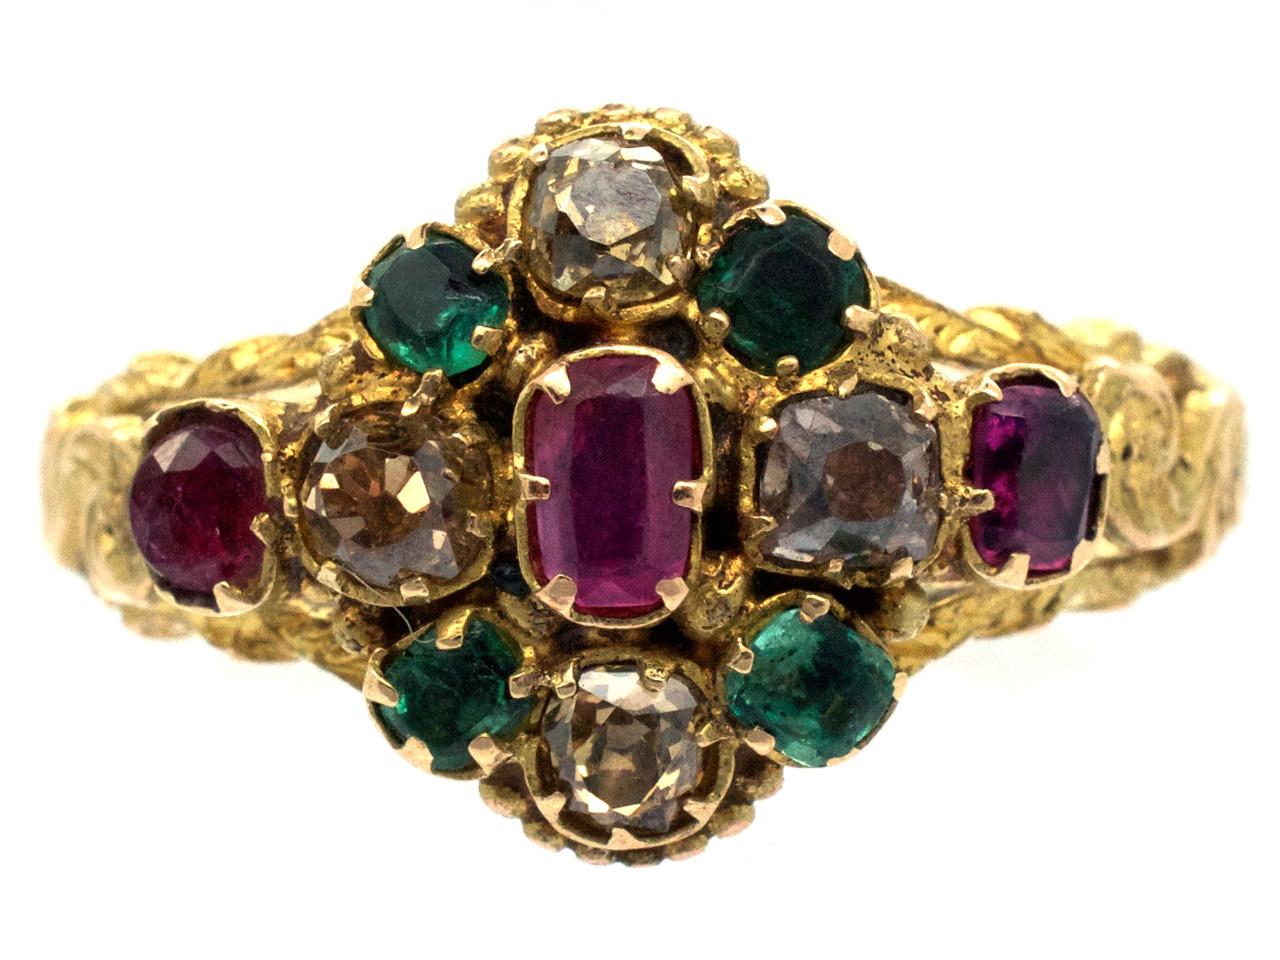 Regency 15ct Gold Emerald, Ruby & Topaz Cluster Ring